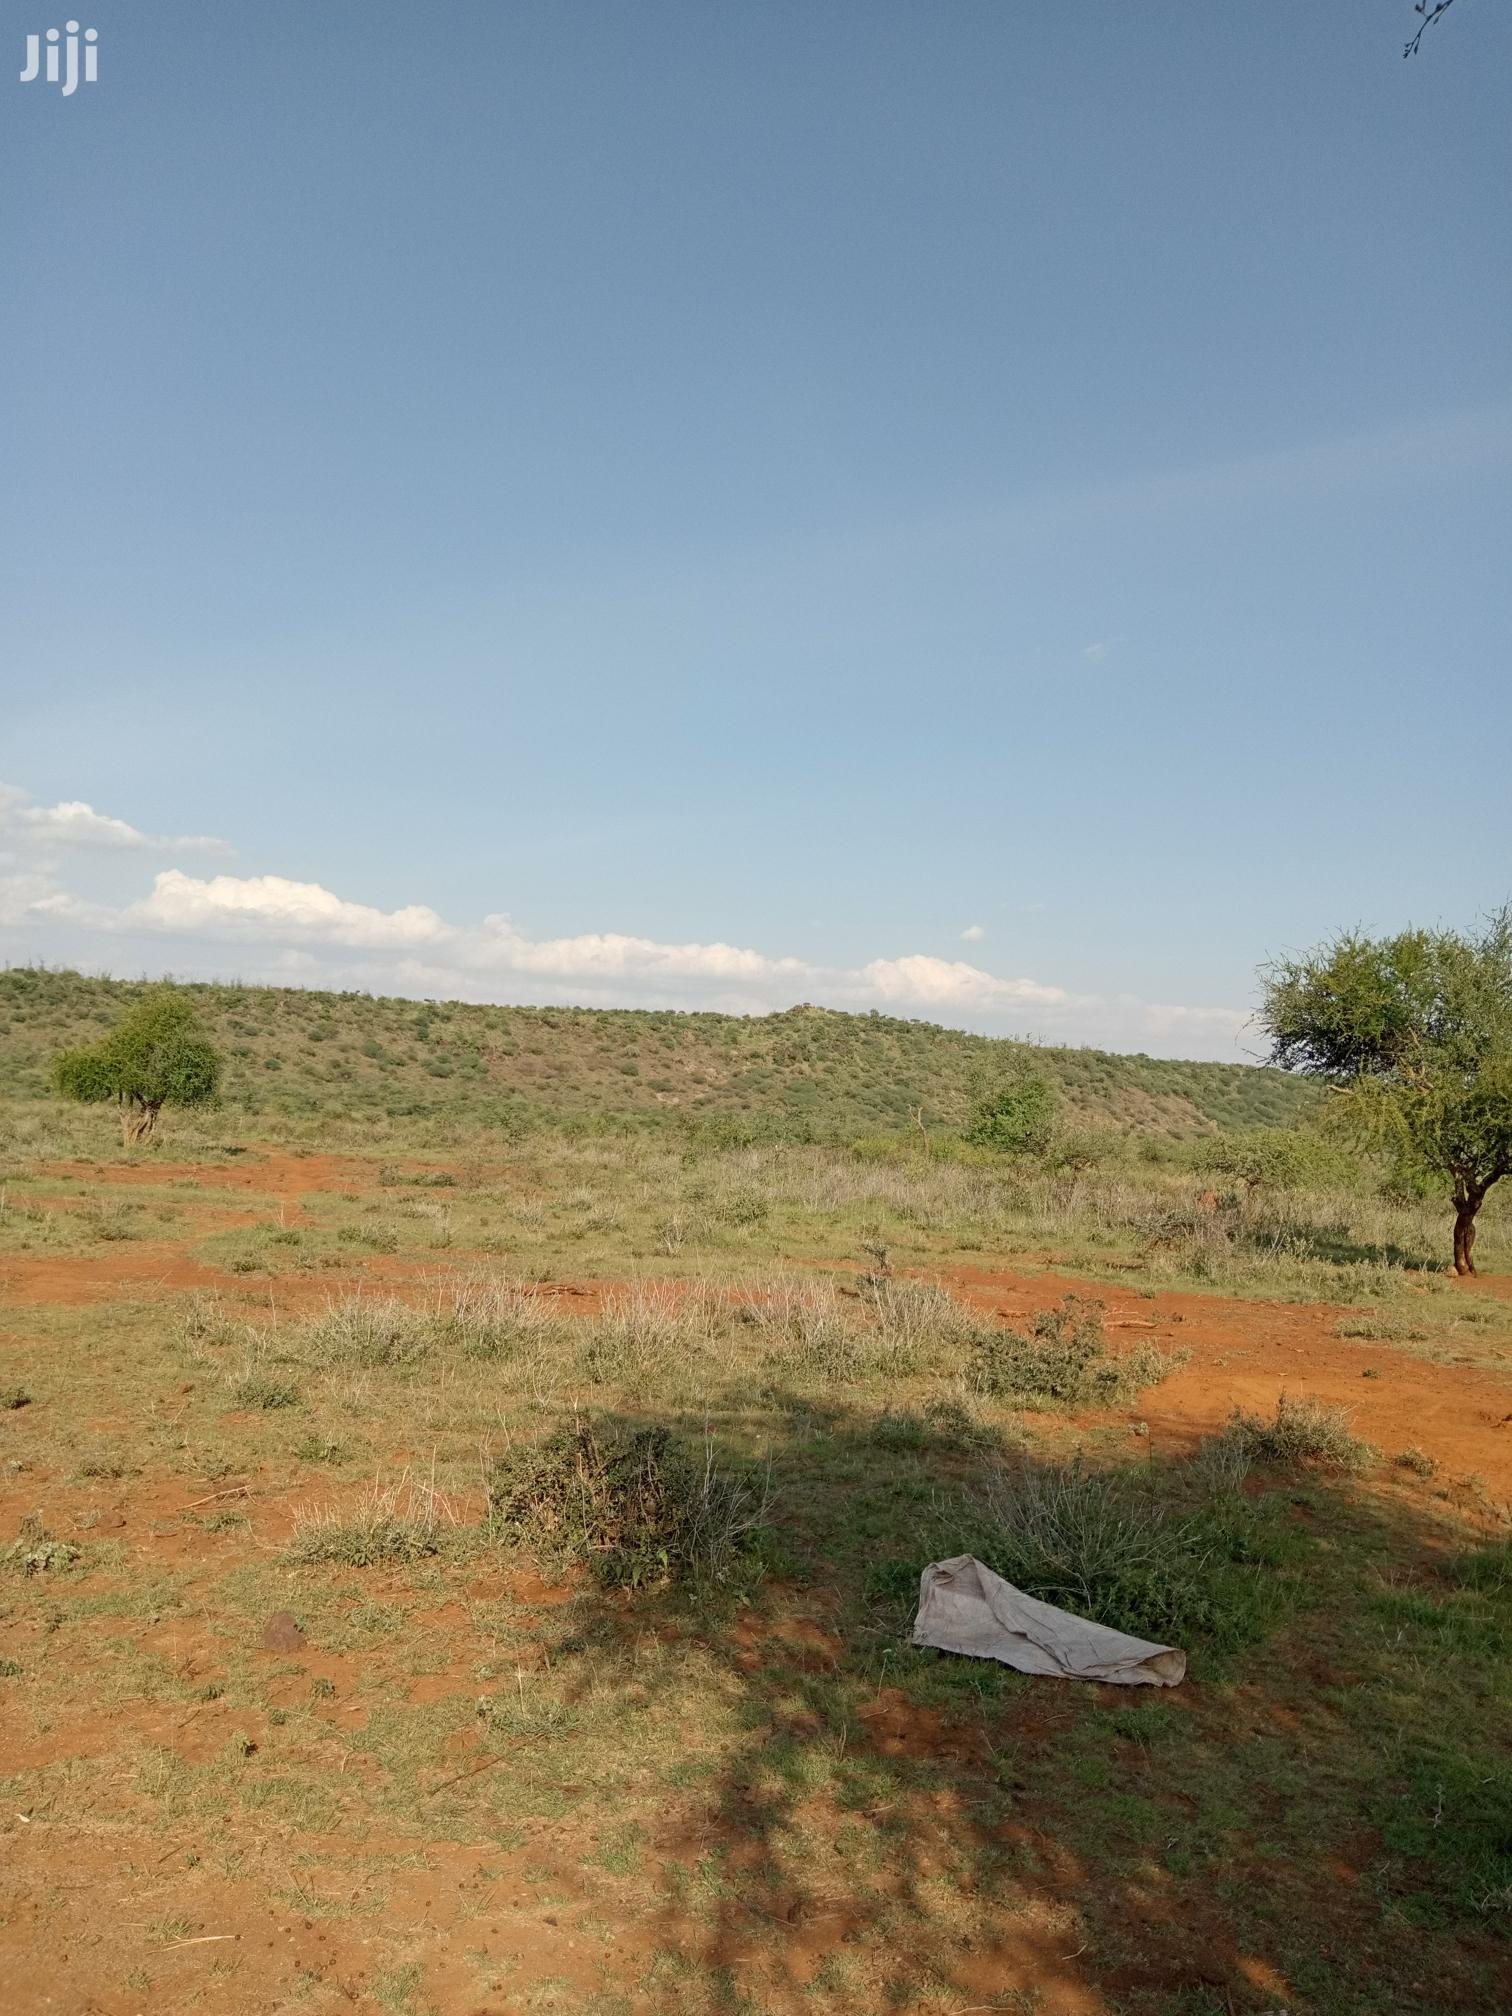 50acres Ilkisumeti  | Land & Plots For Sale for sale in Ngong, Kajiado, Kenya